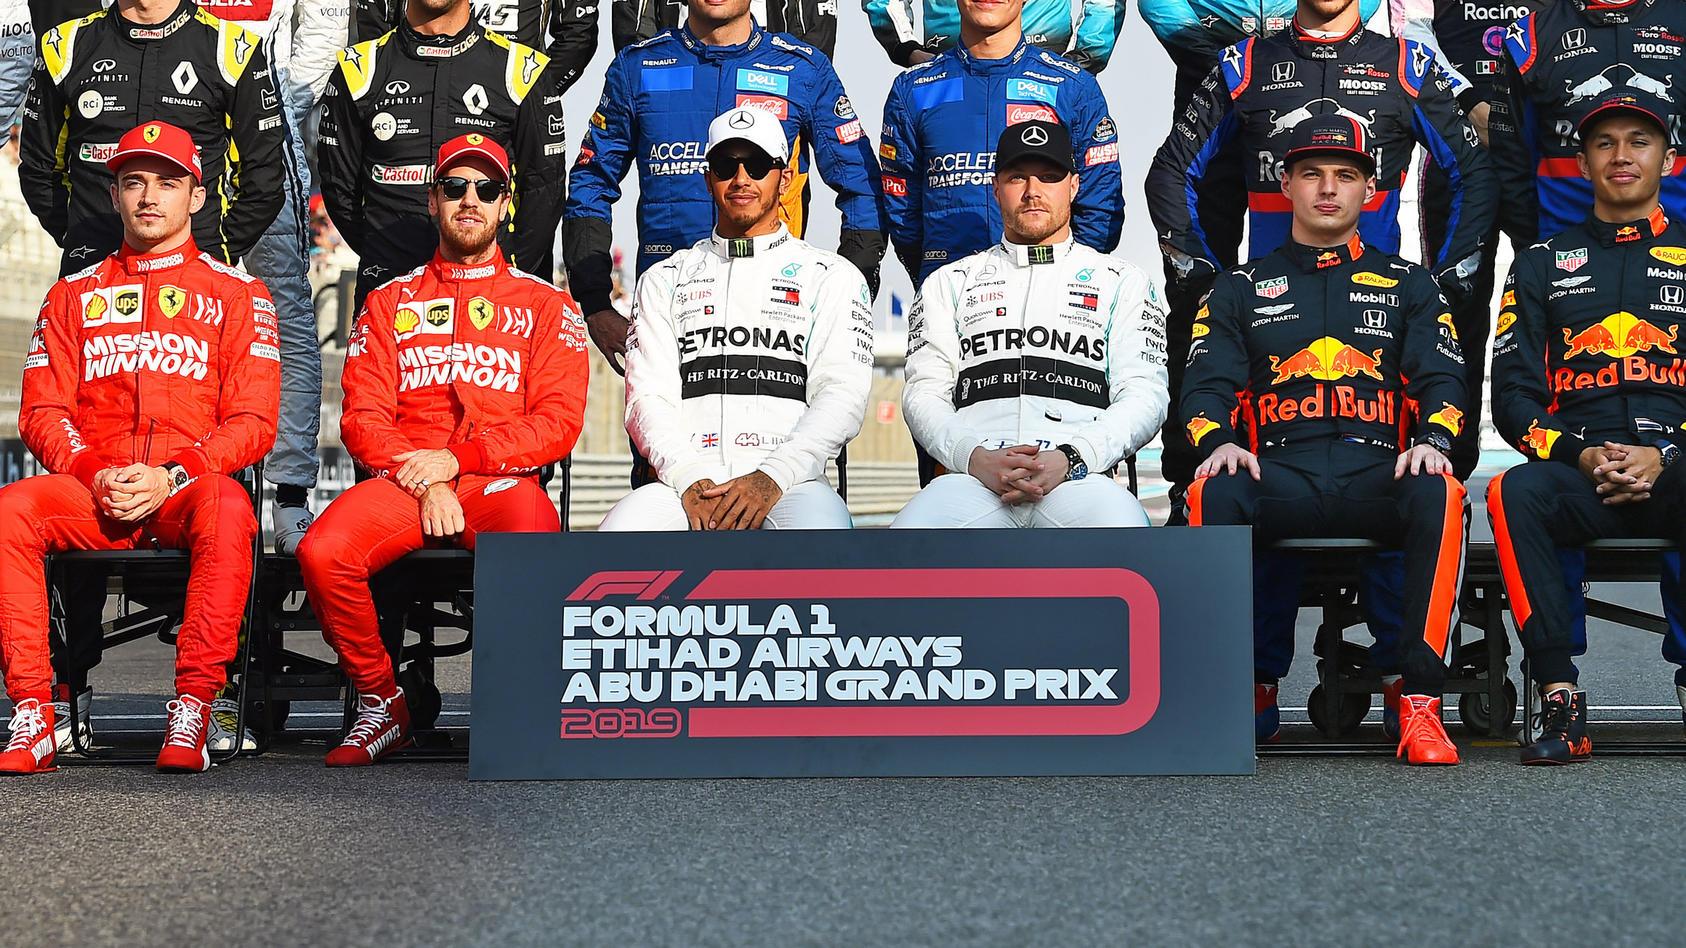 Formel Eins Fahrer